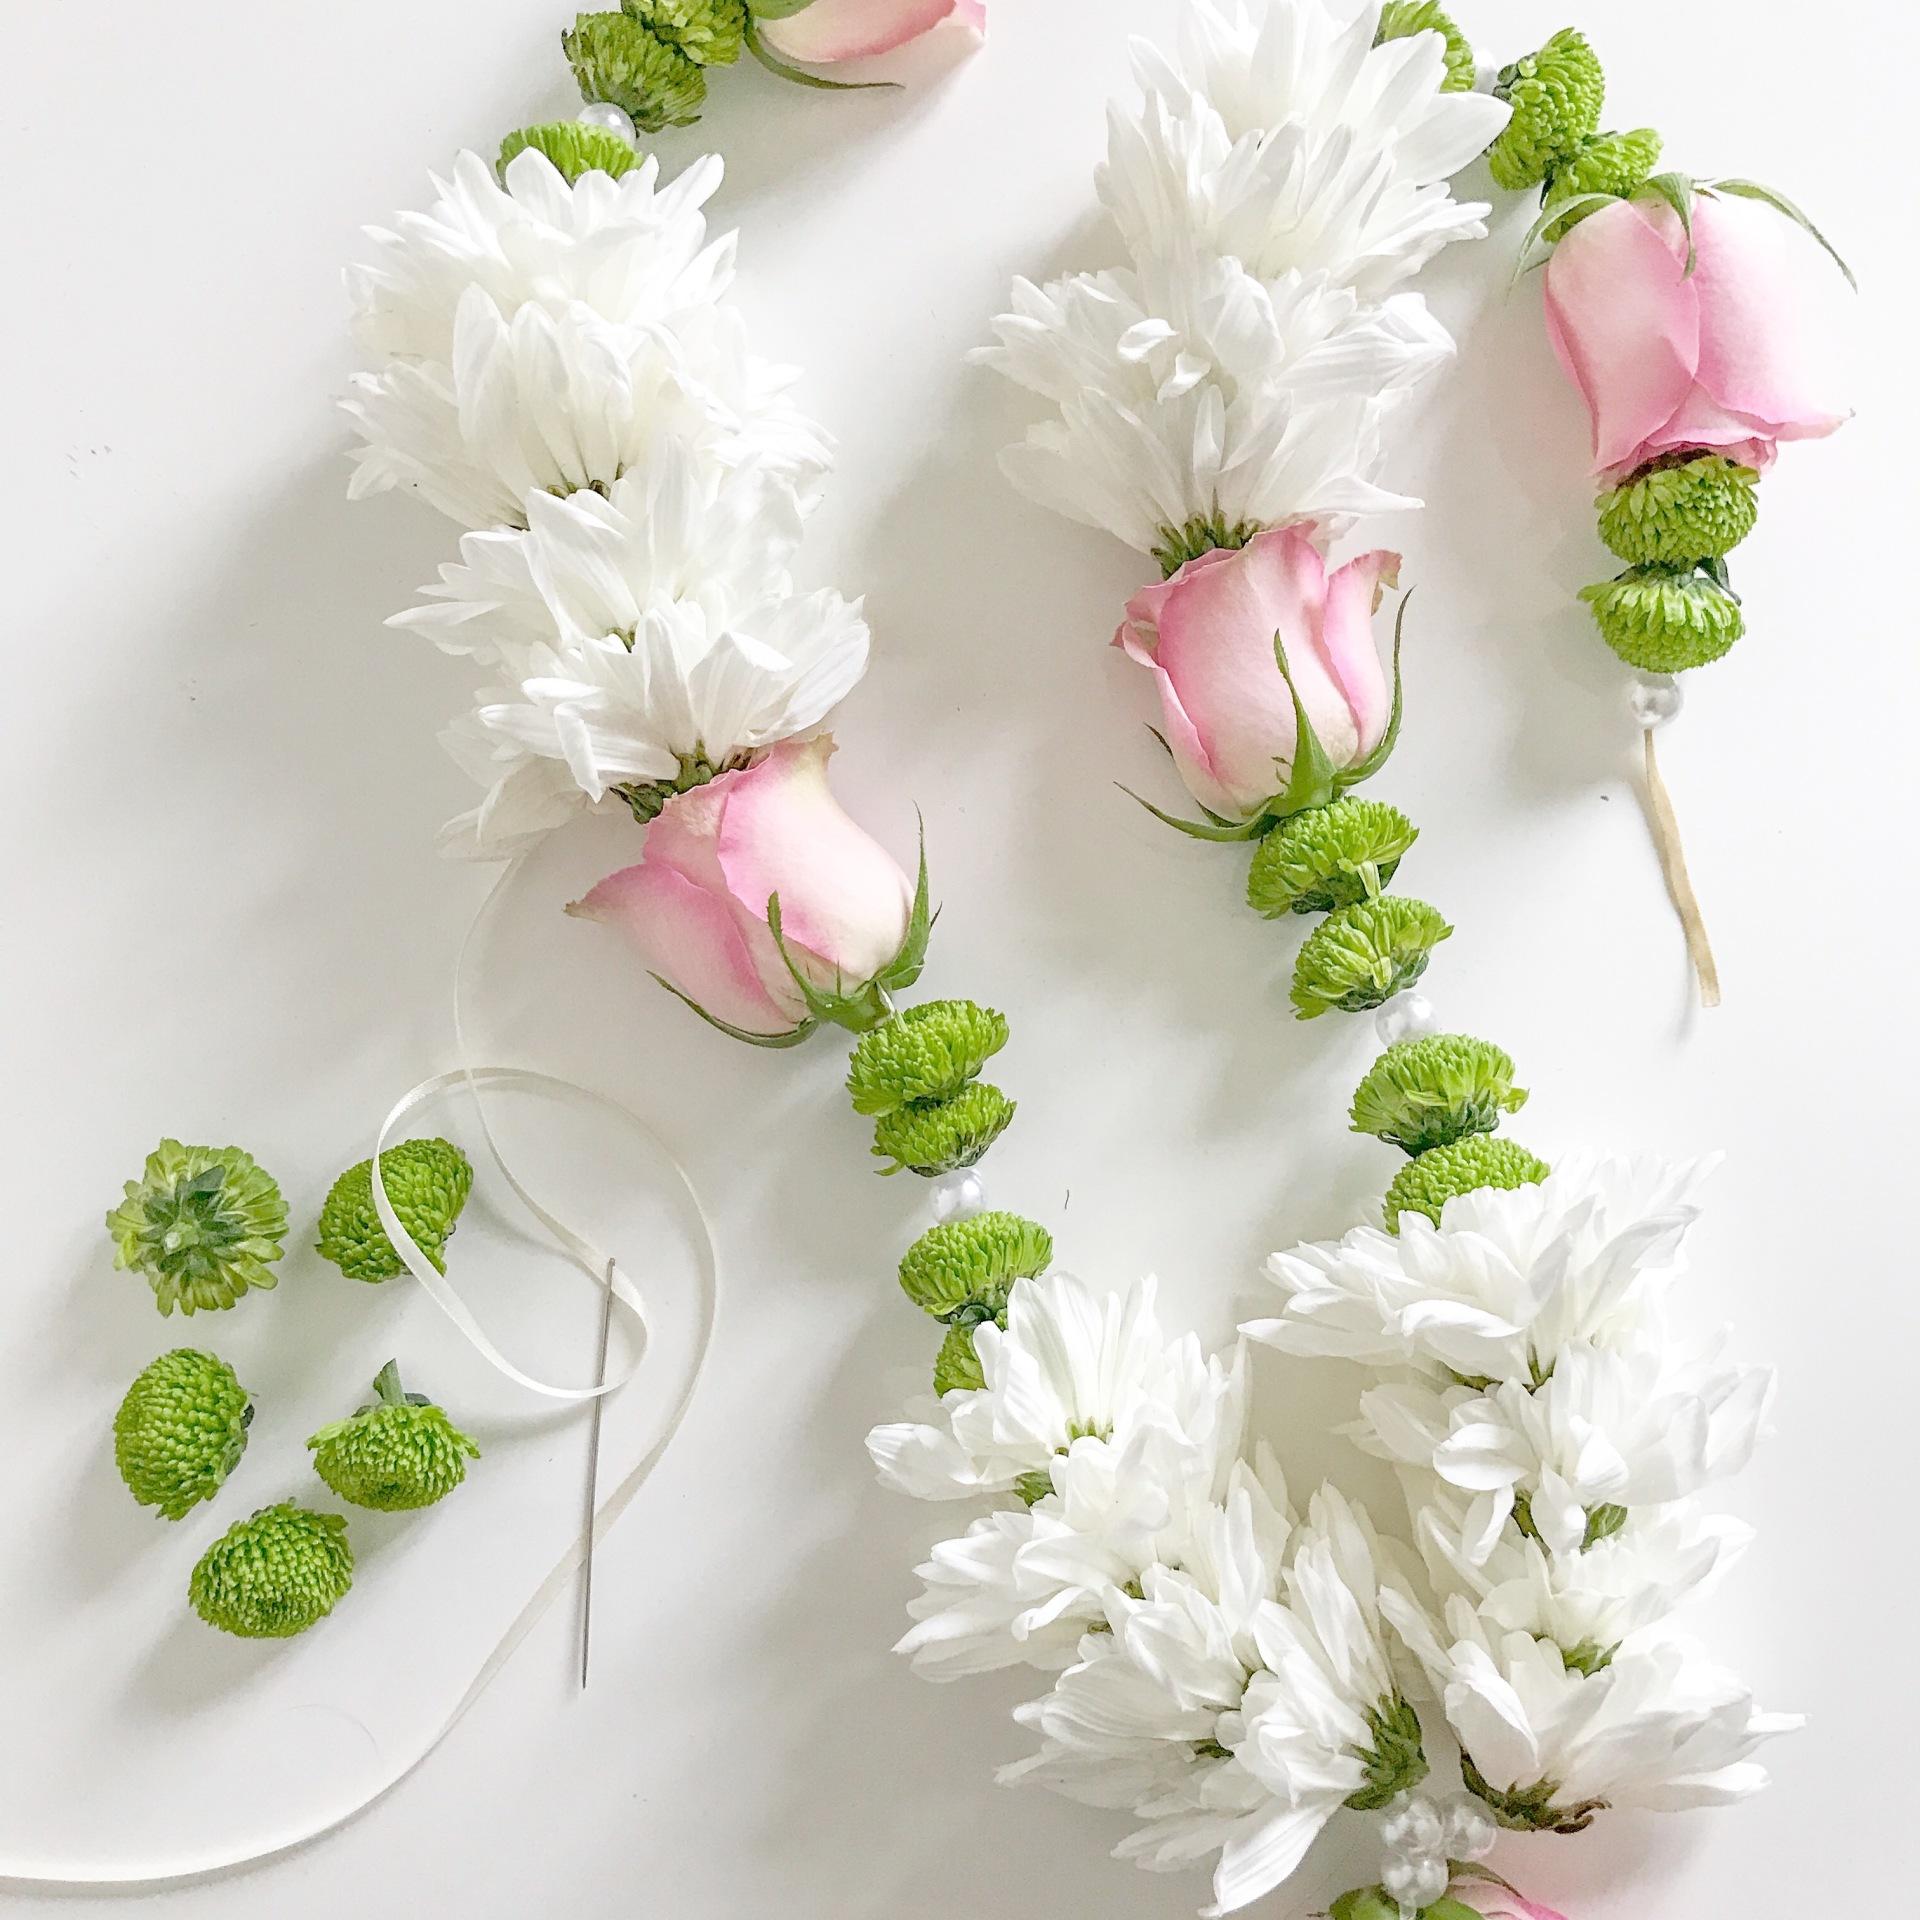 Indian wedding garland | Asian wedding garland | wedding garland | Indian wedding flowers | london florist | varmala | haar | Sikh garland | Hindu garland